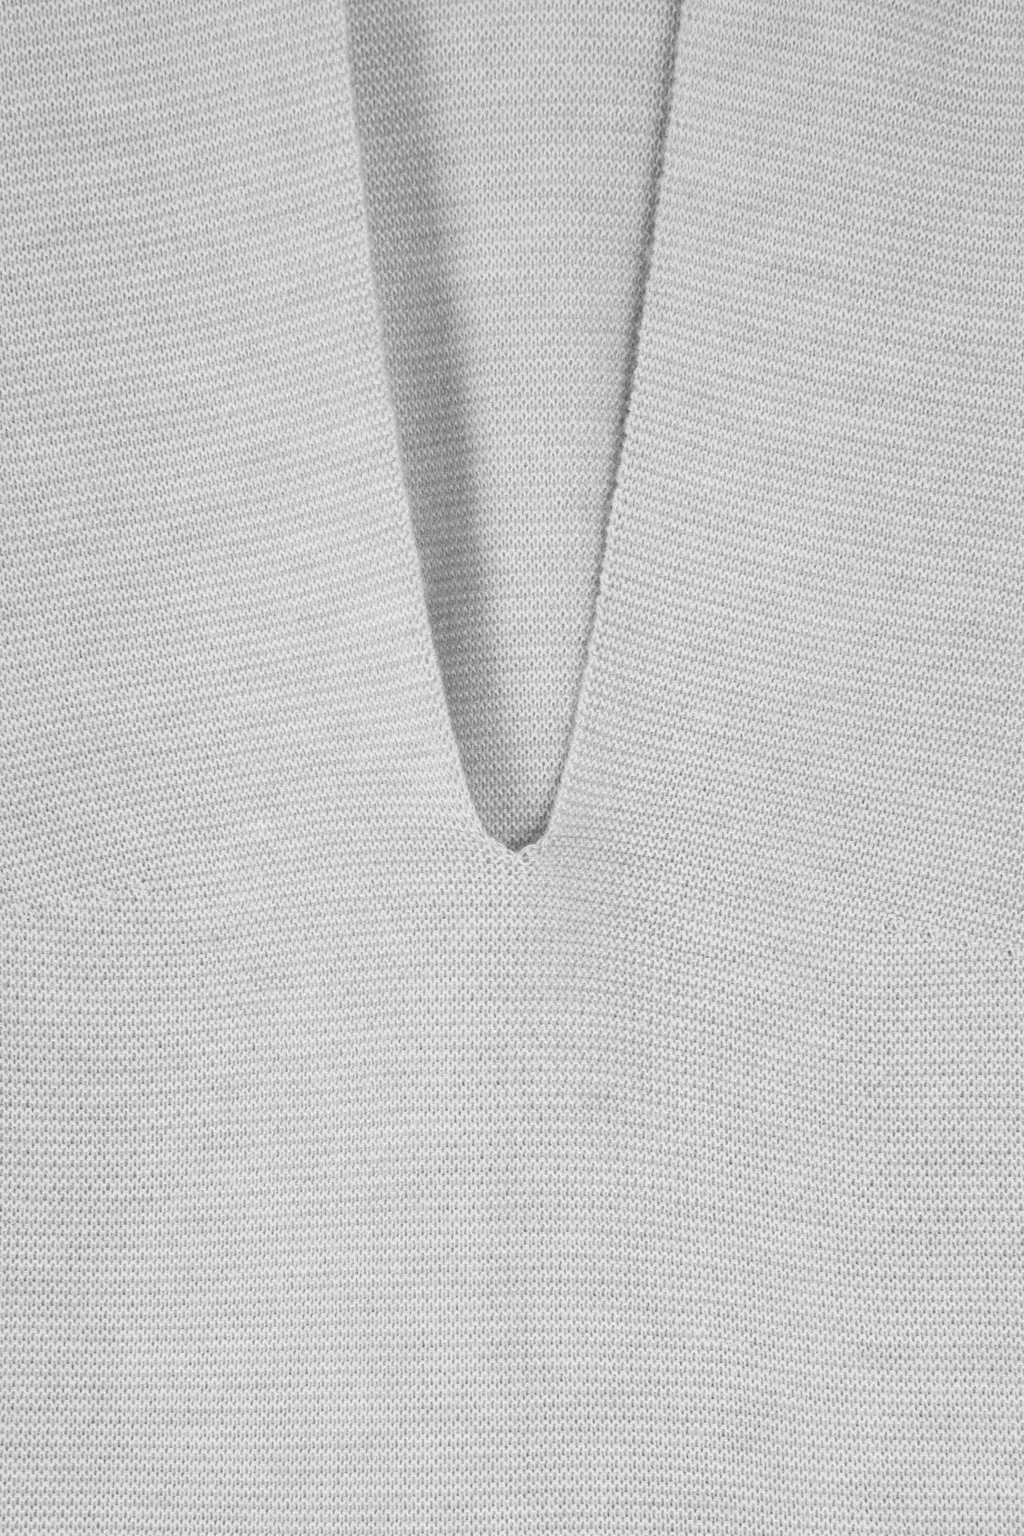 Sweater 21112019 Light Gray 6